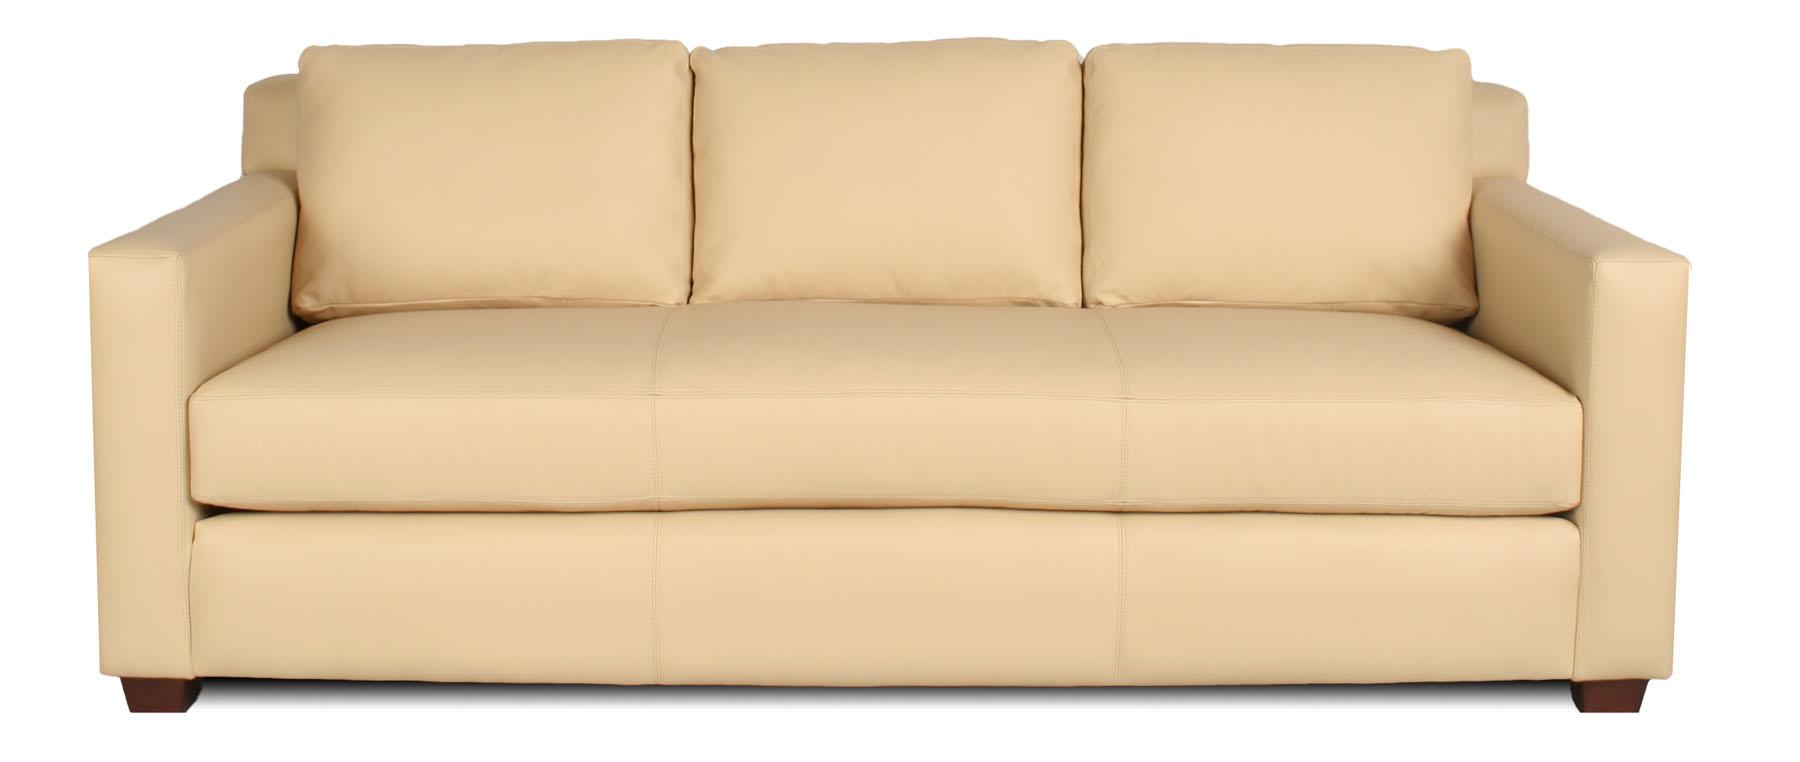 Burt Leather Furniture